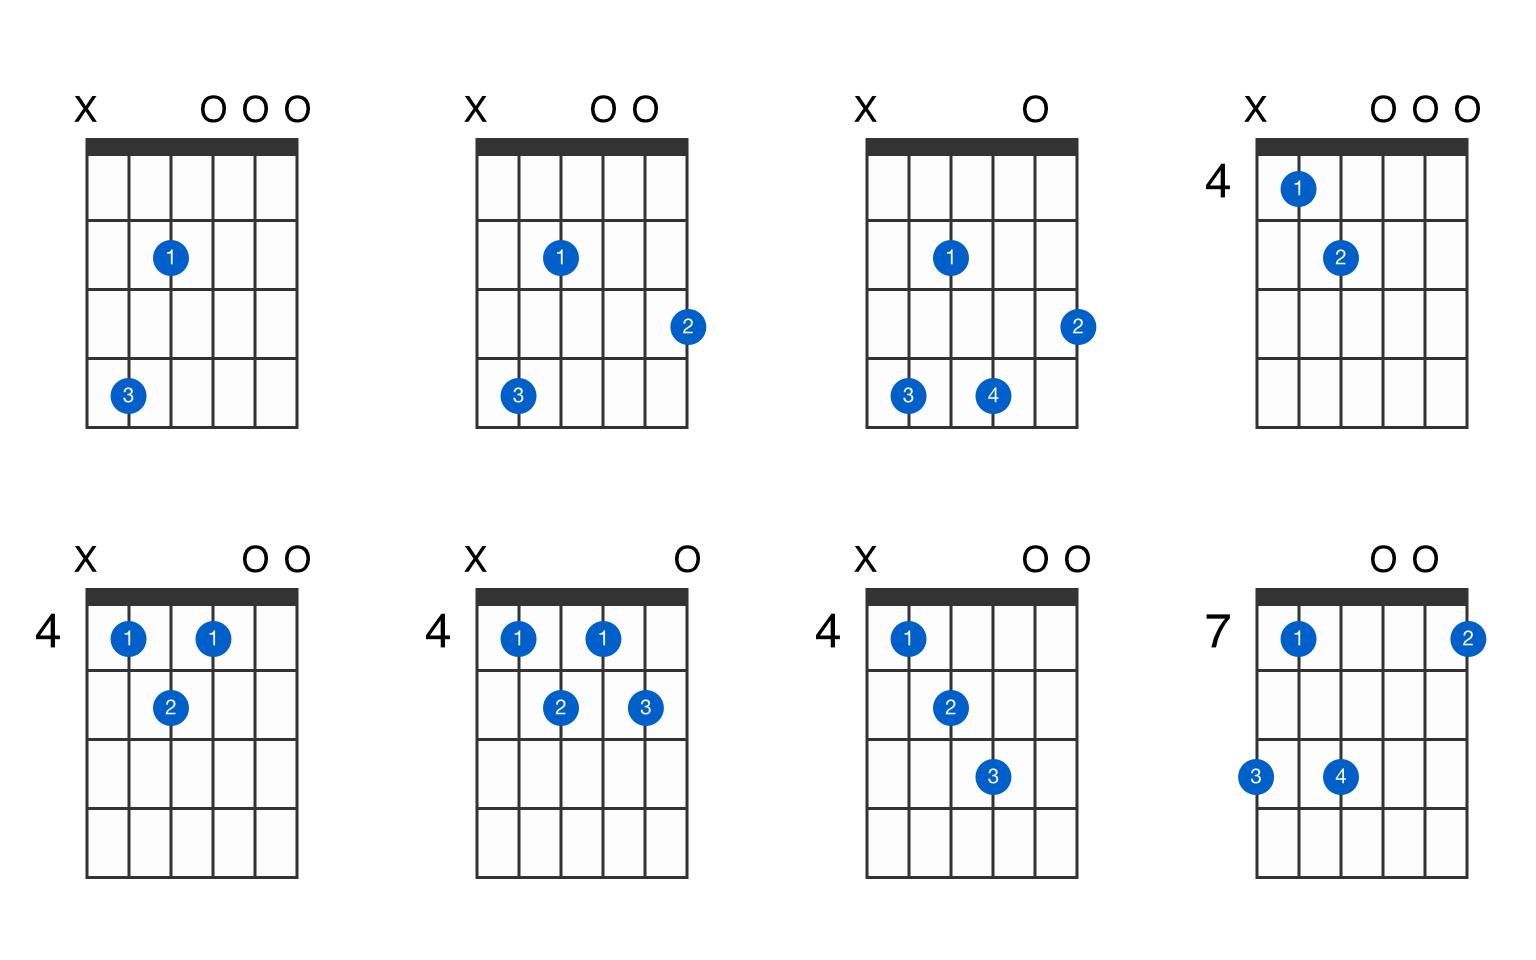 D flat minor 115th flat 15 guitar chord   GtrLib Chords